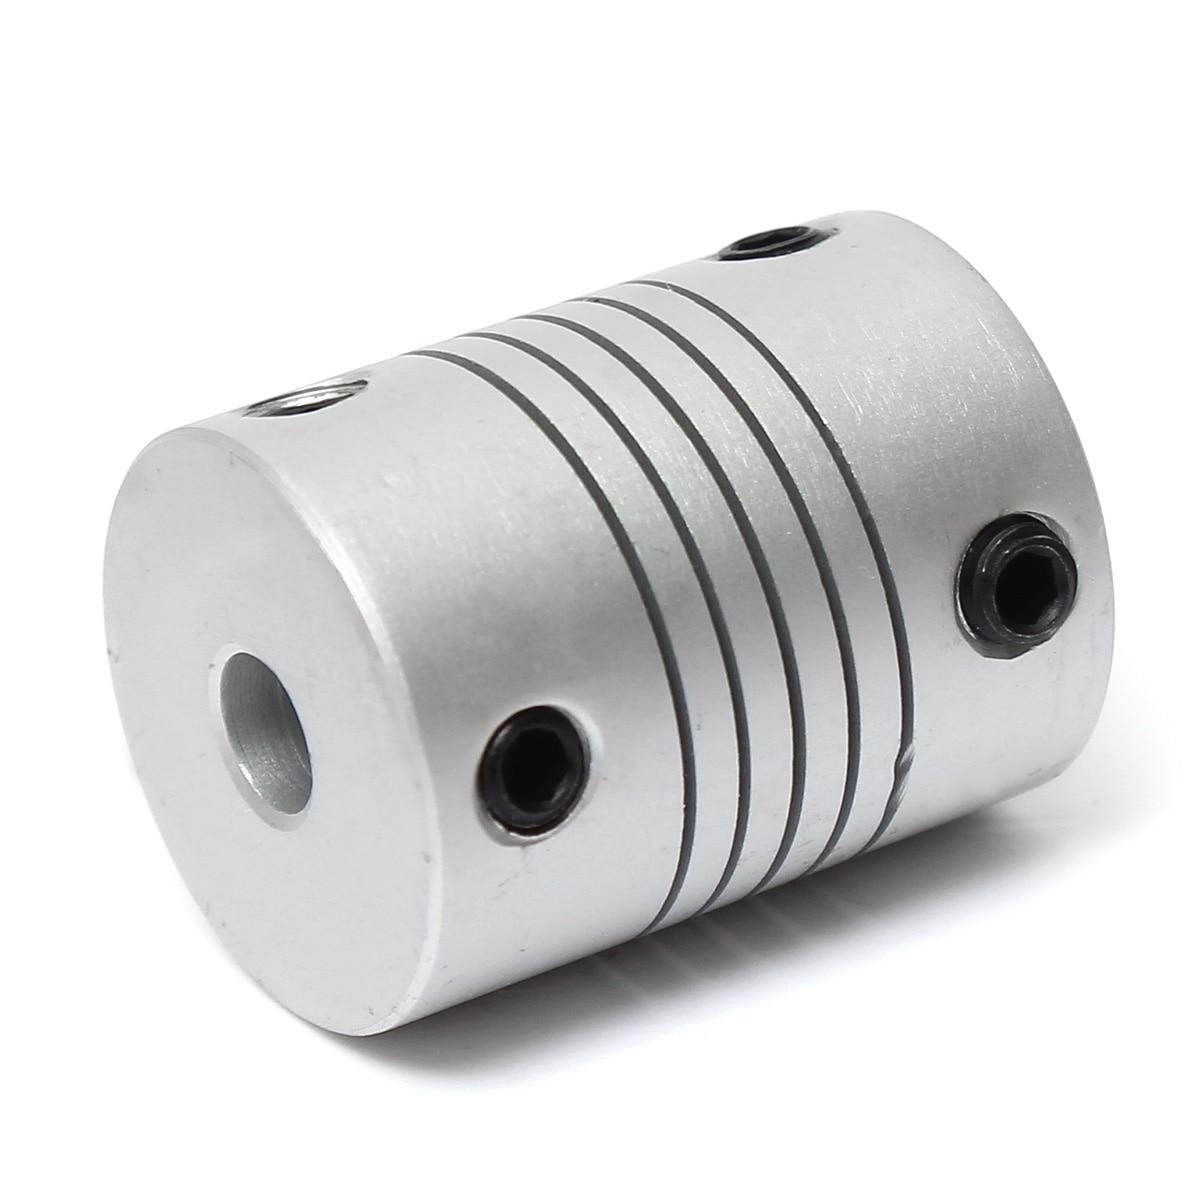 Fevas 4mm x 6mm Aluminum Flexible Shaft Coupling OD19mm x L25mm CNC Stepper Motor Coupler Connector New